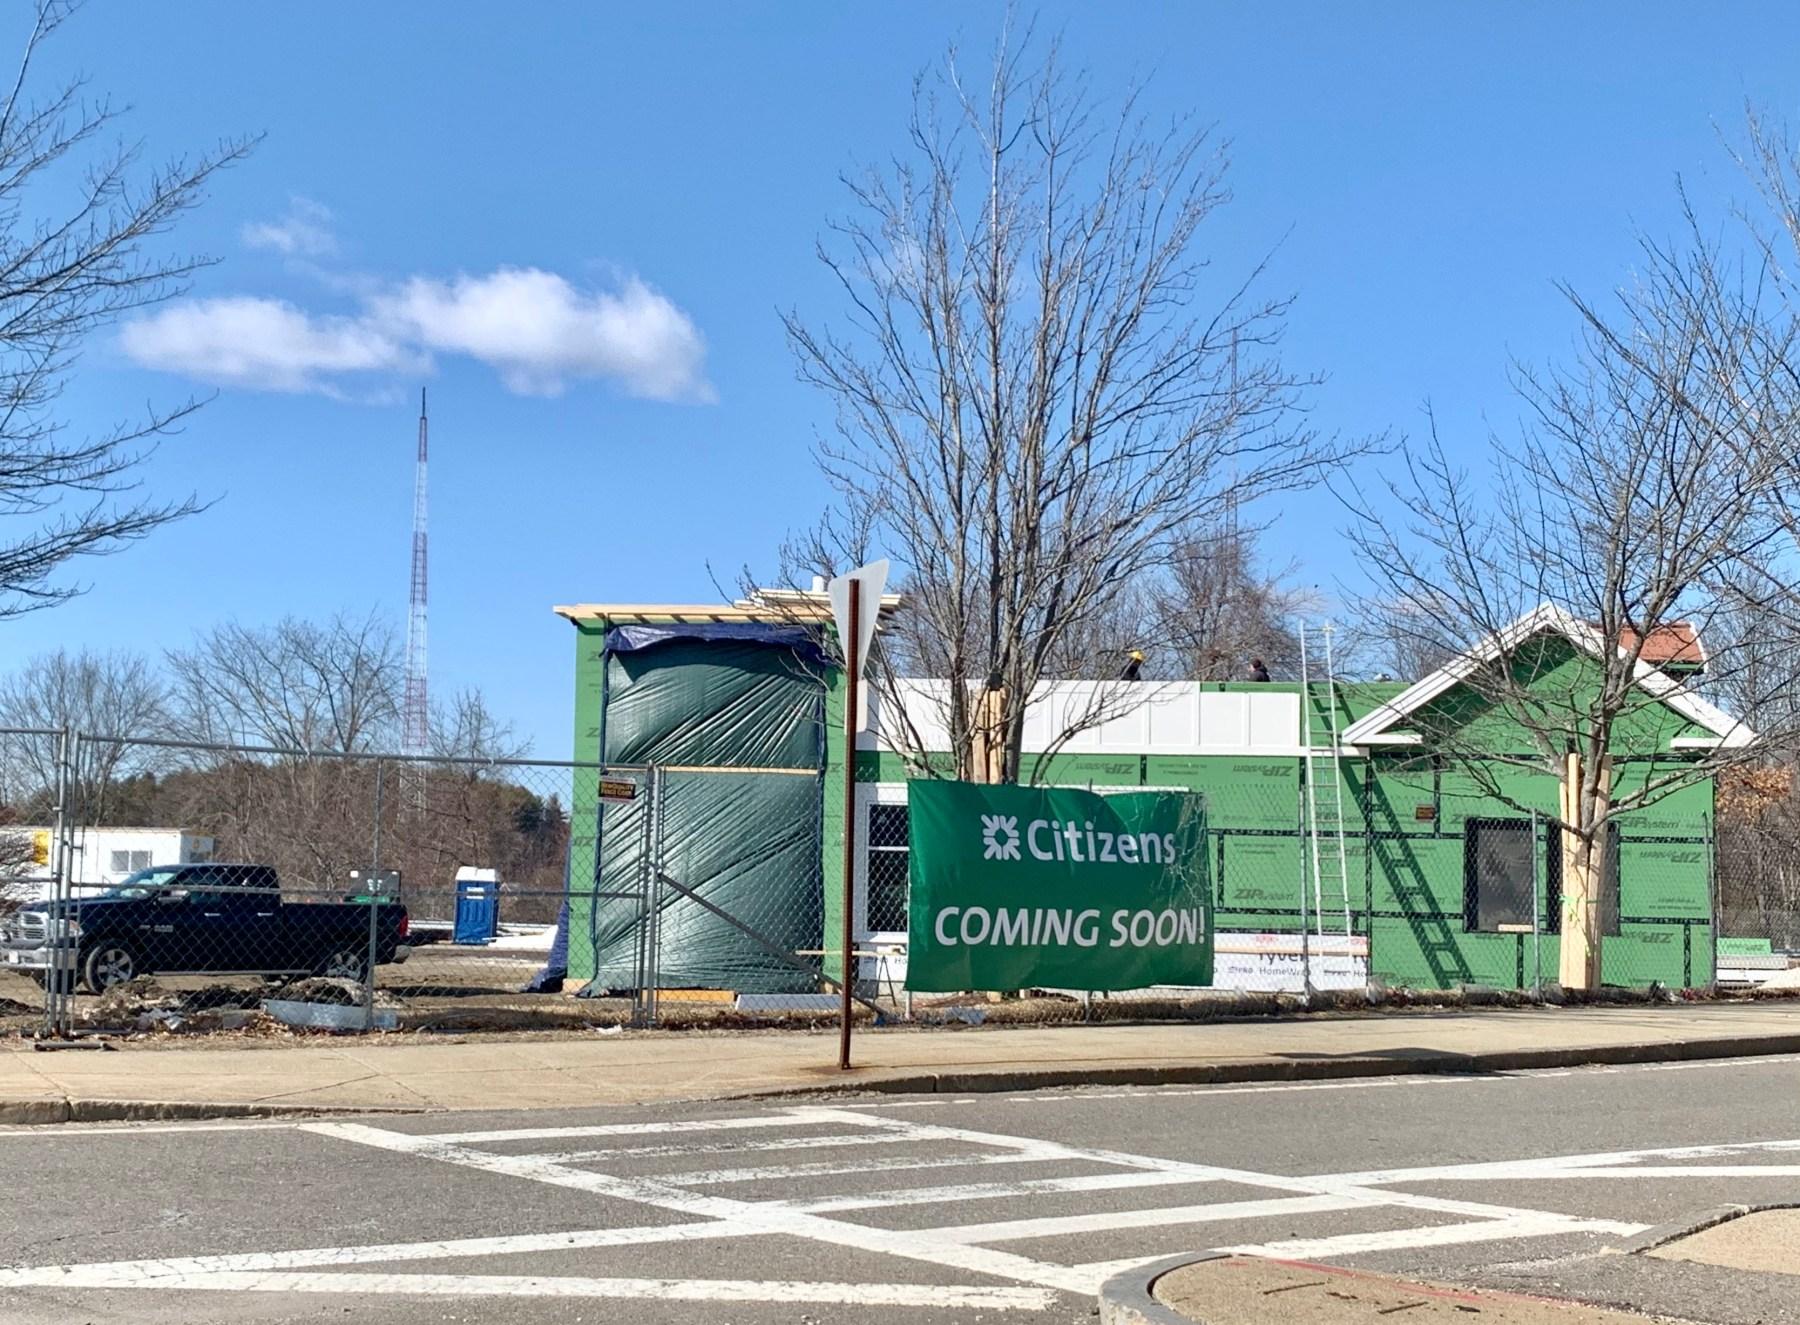 Citizens Bank under construction, Burlington Mall Road 2021